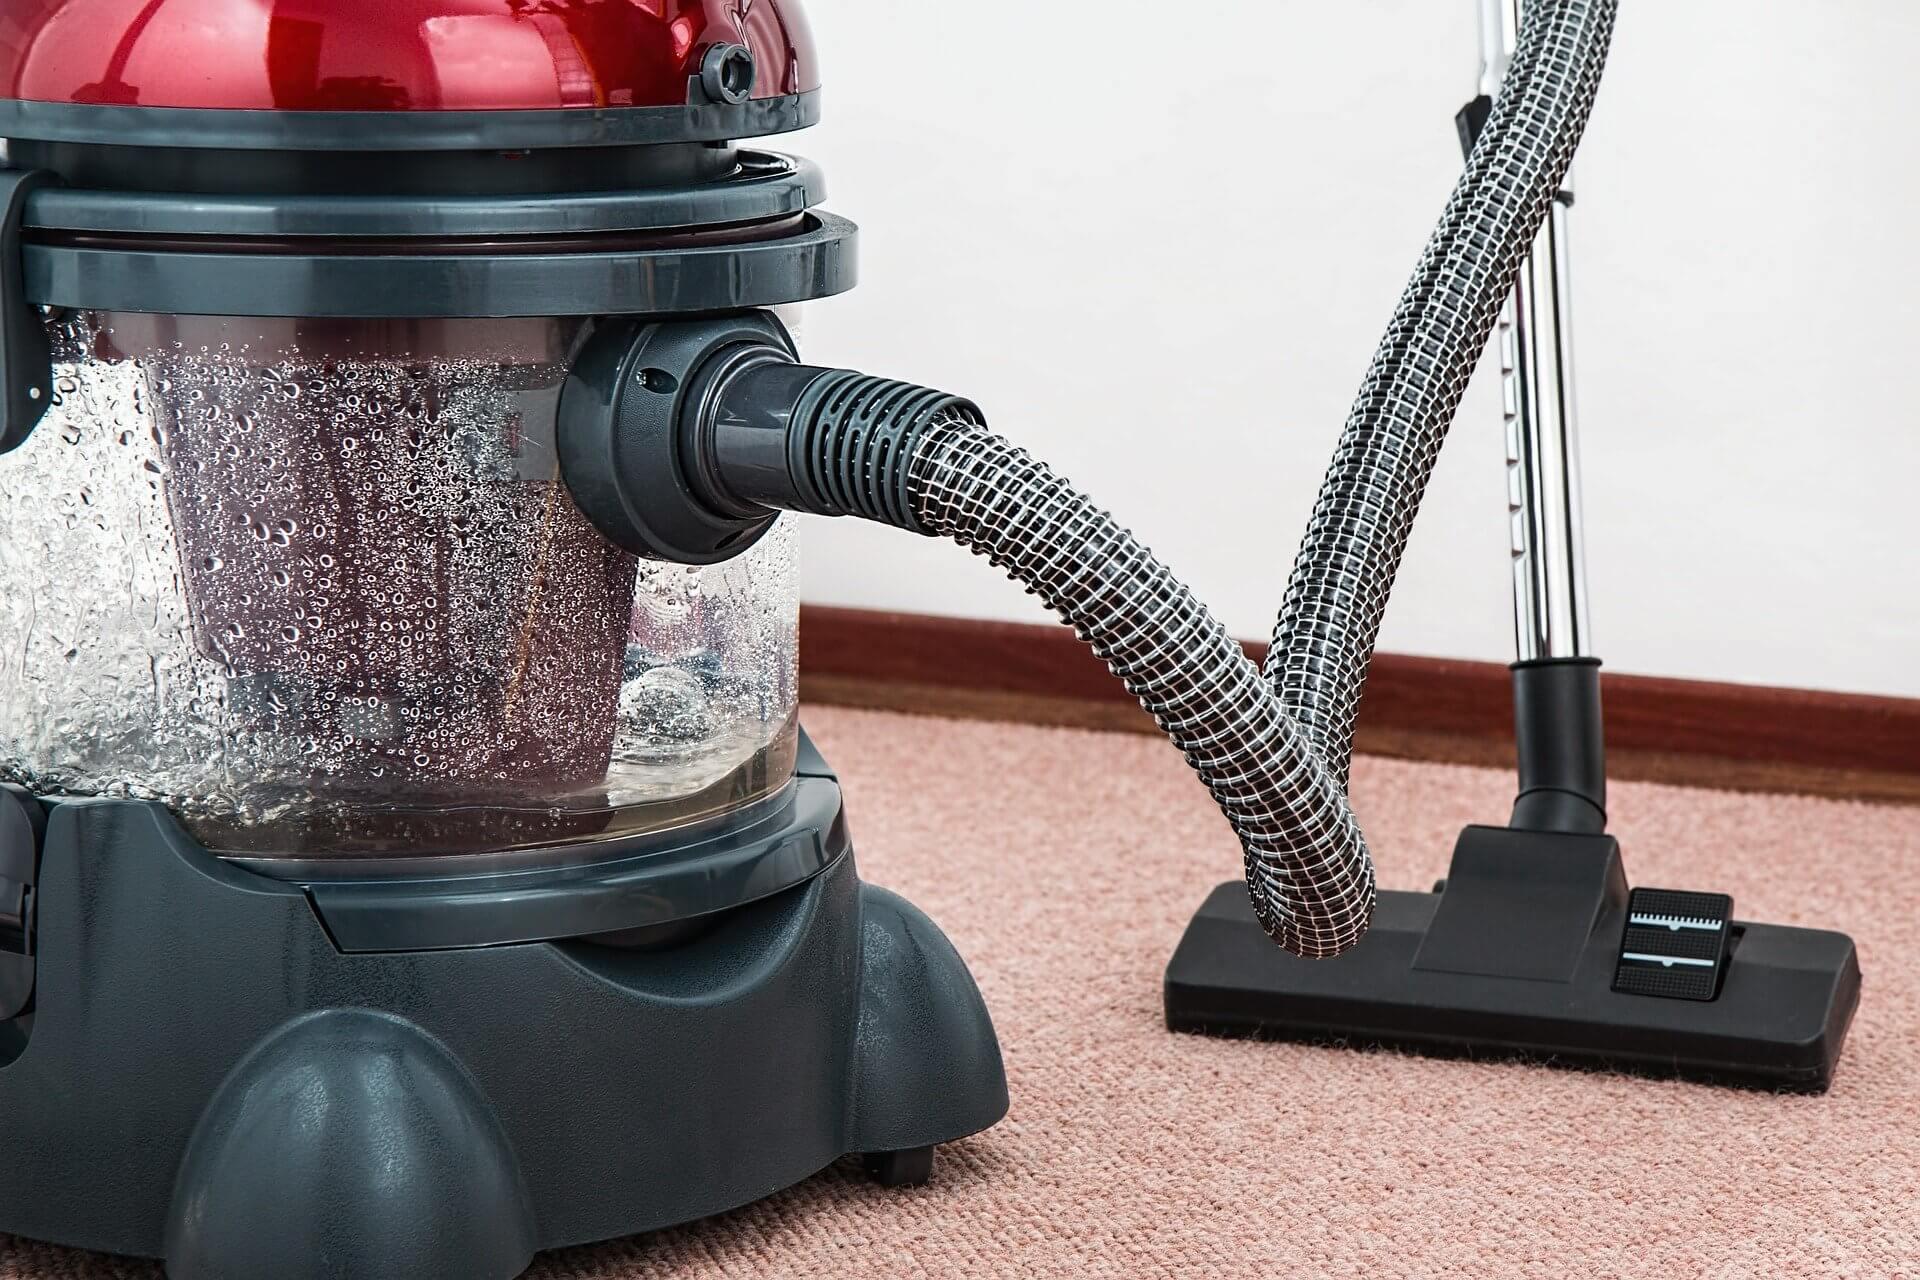 How To Make A Pool Vacuum Using A Garden Hose